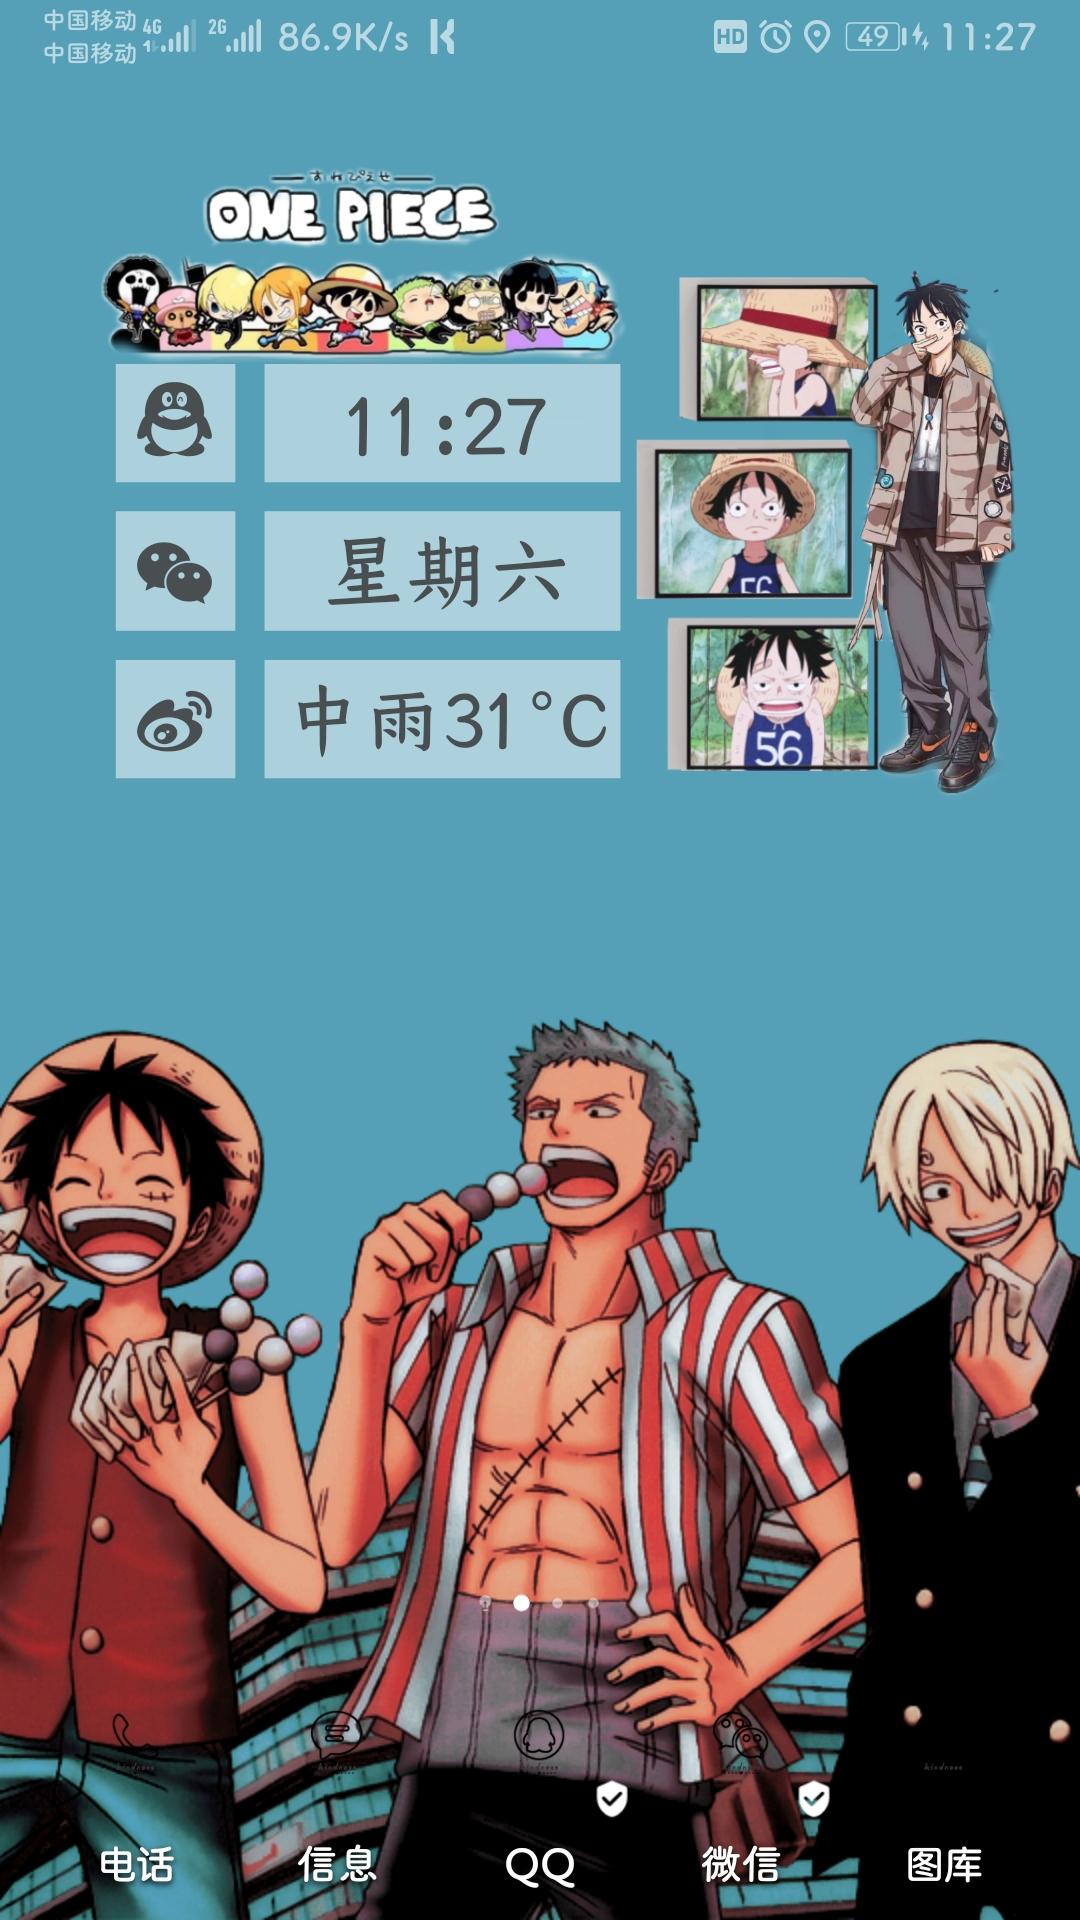 Screenshot_20200801_112713_com.huawei.android.lau.jpg